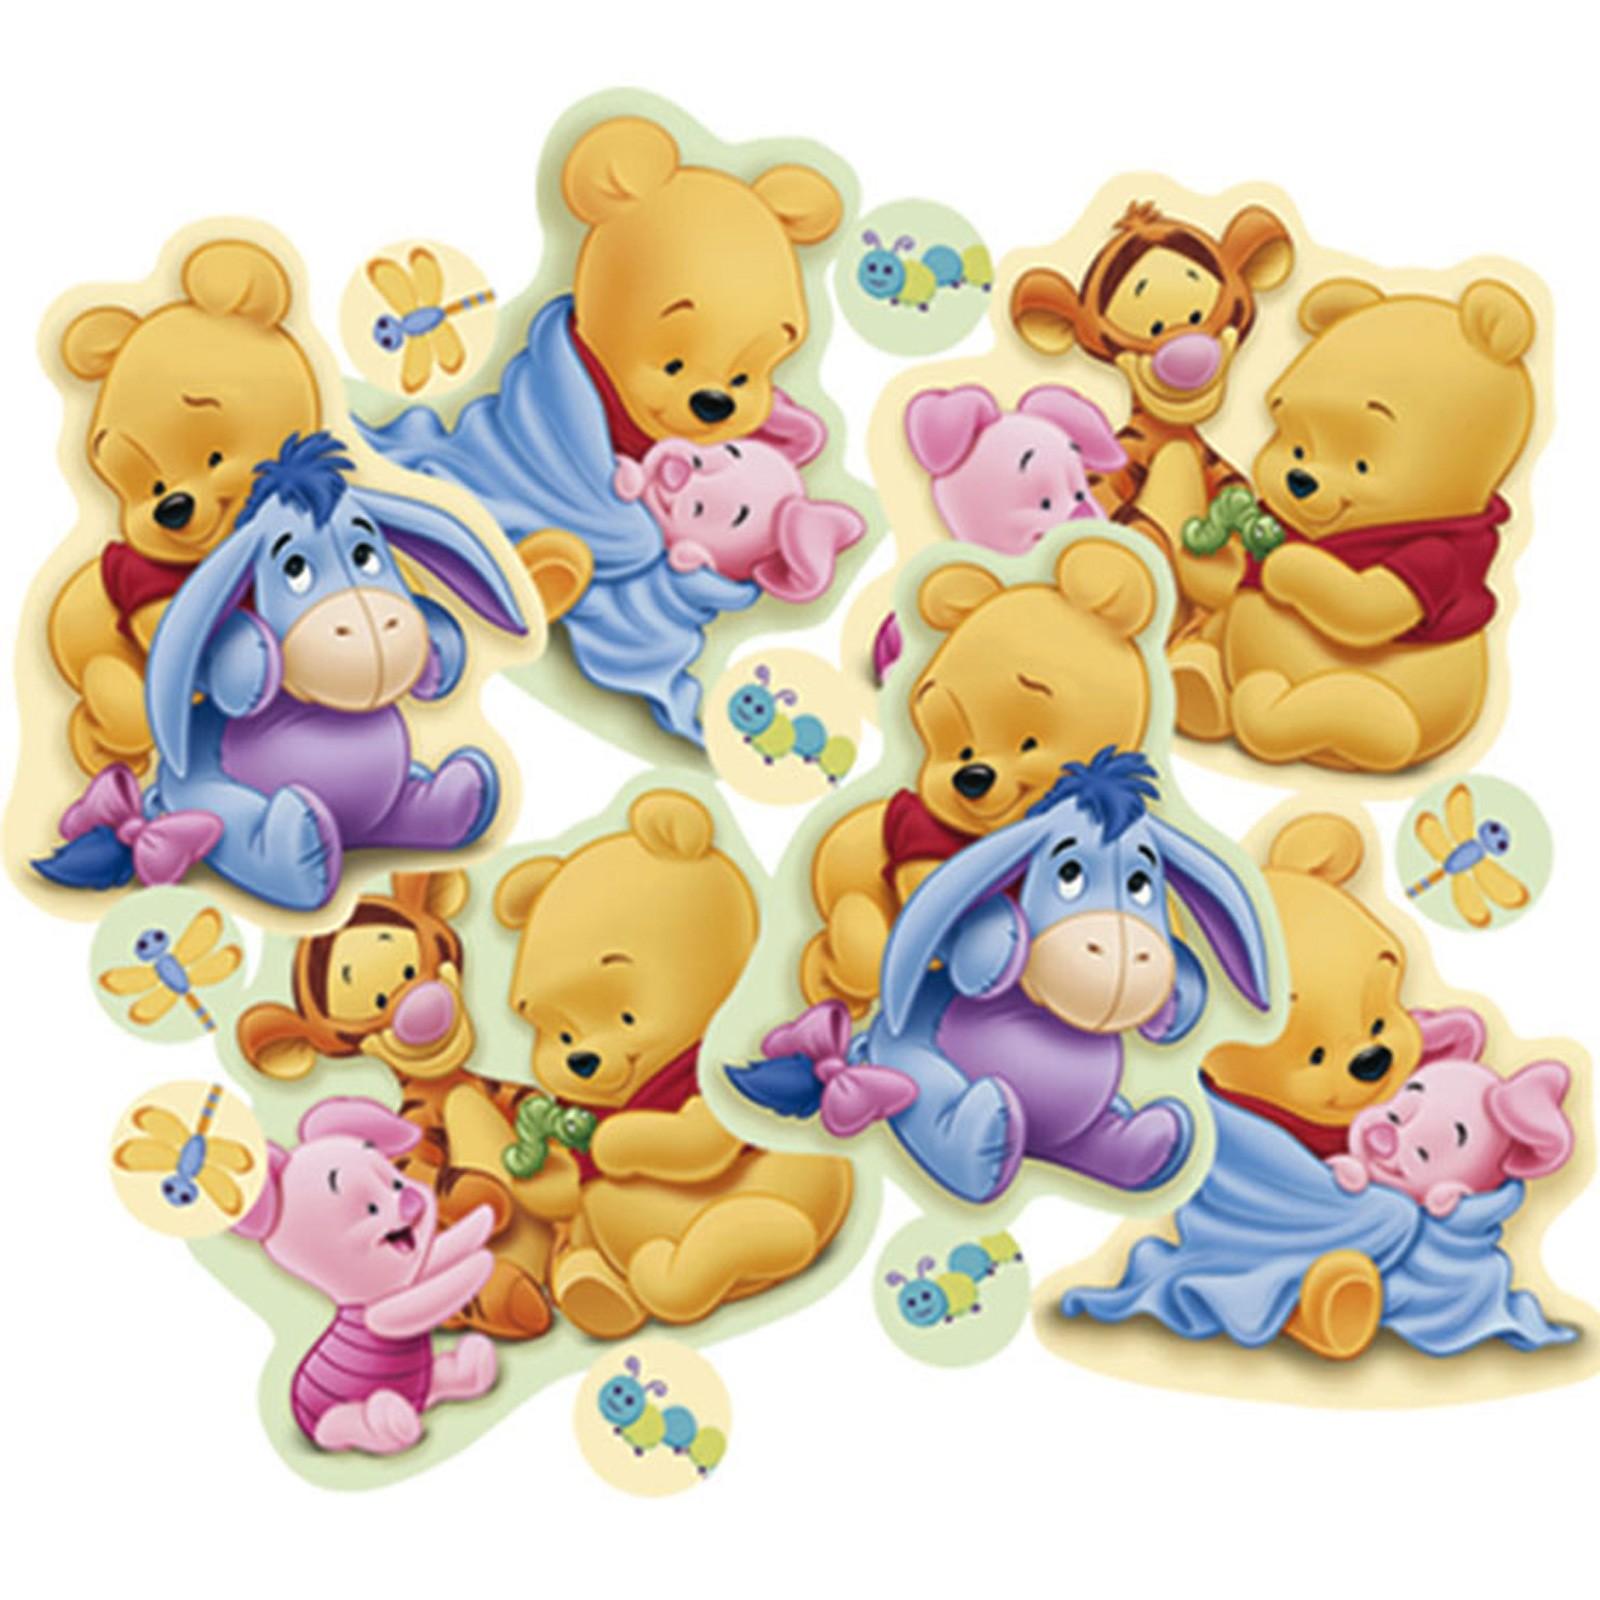 Pooh Bear Wallpaper Baby Pooh Photo 24007561 Fanpop